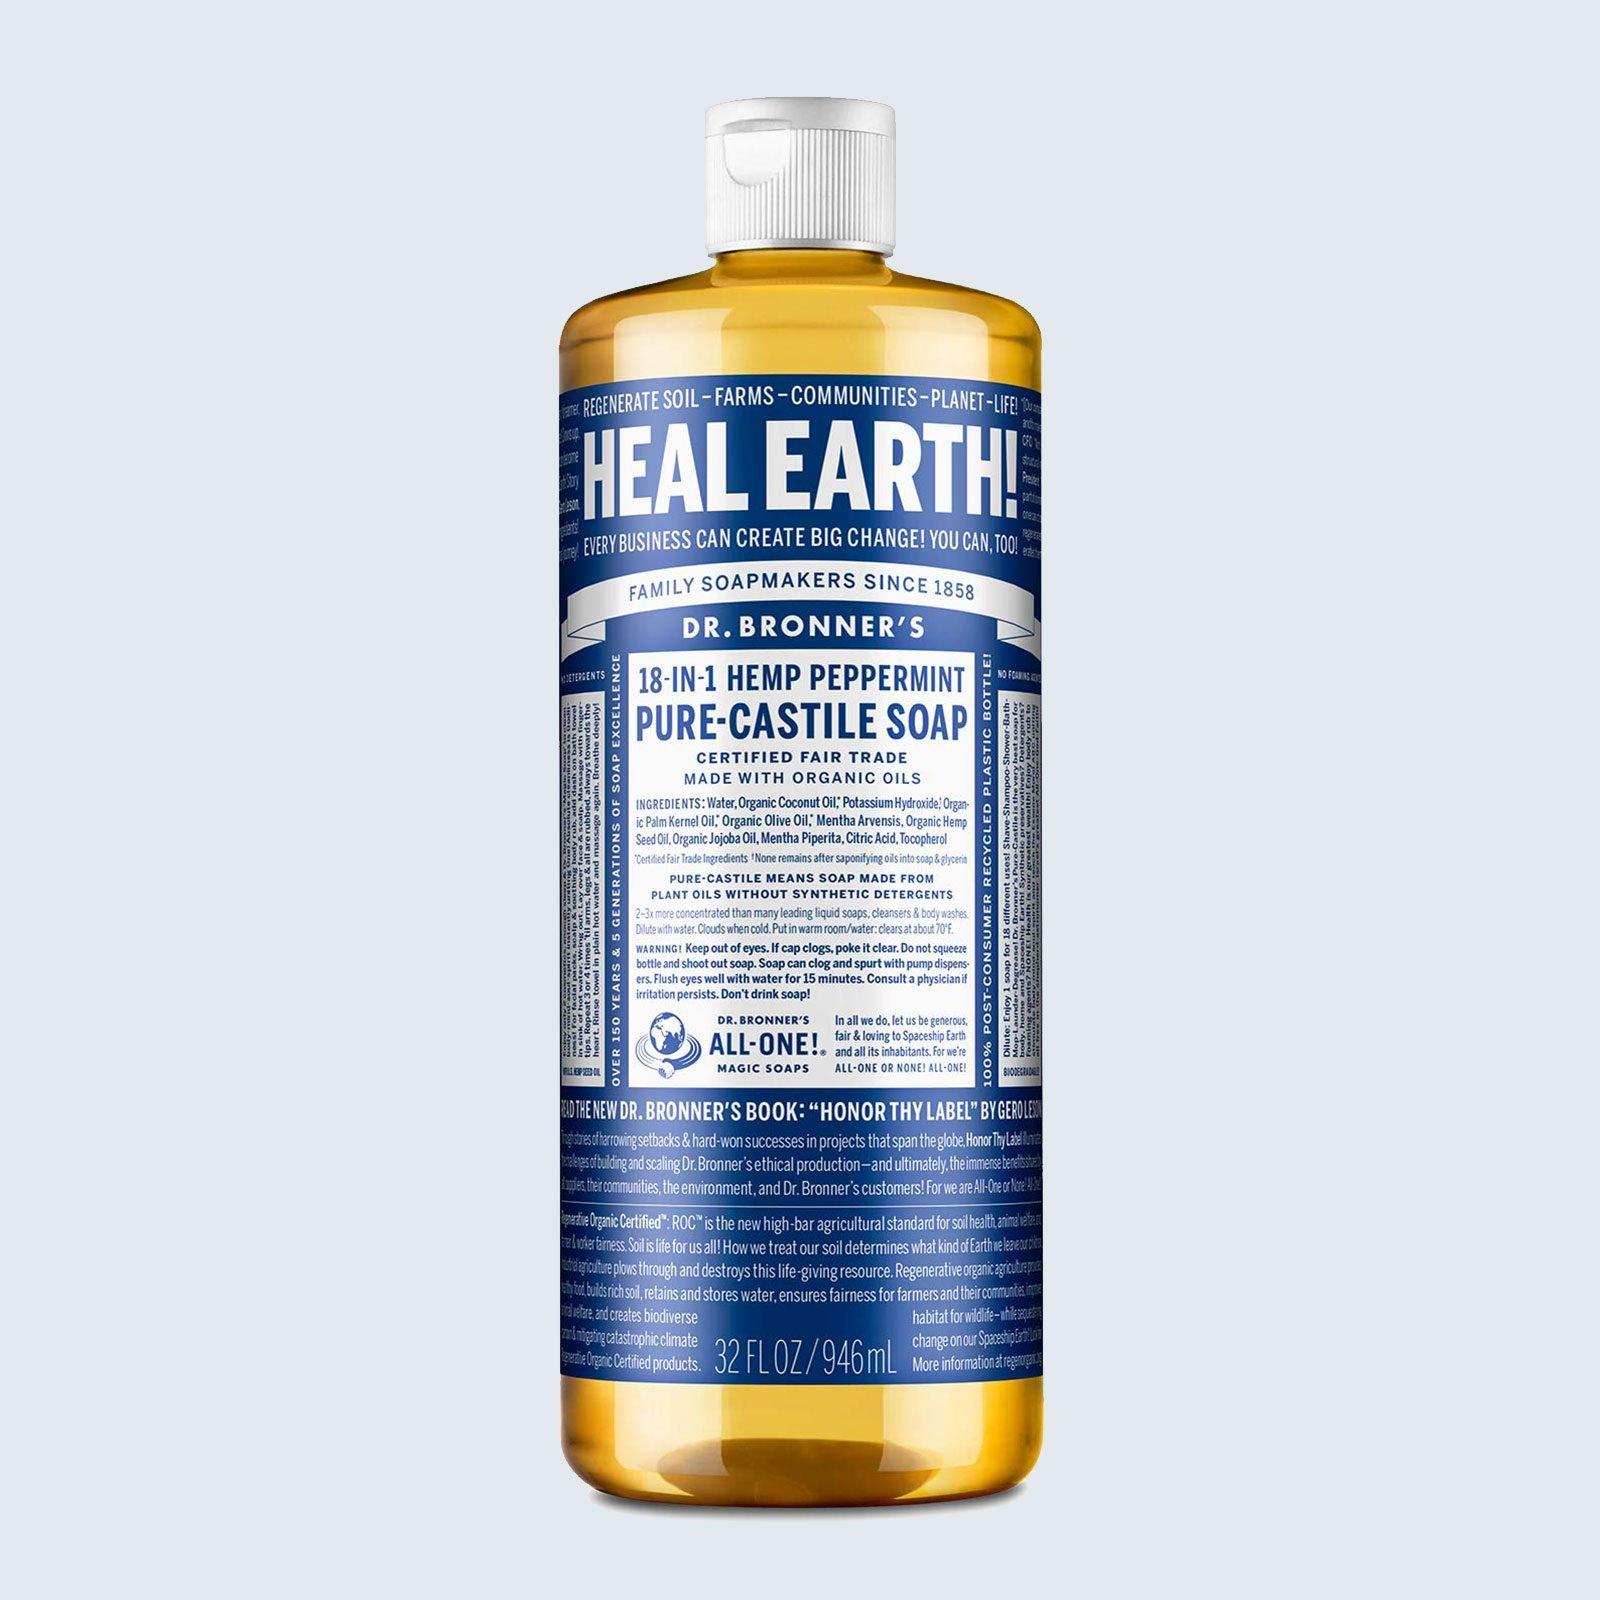 Best liquid soap: Dr. Bronner's Pure Castile Liquid Soap